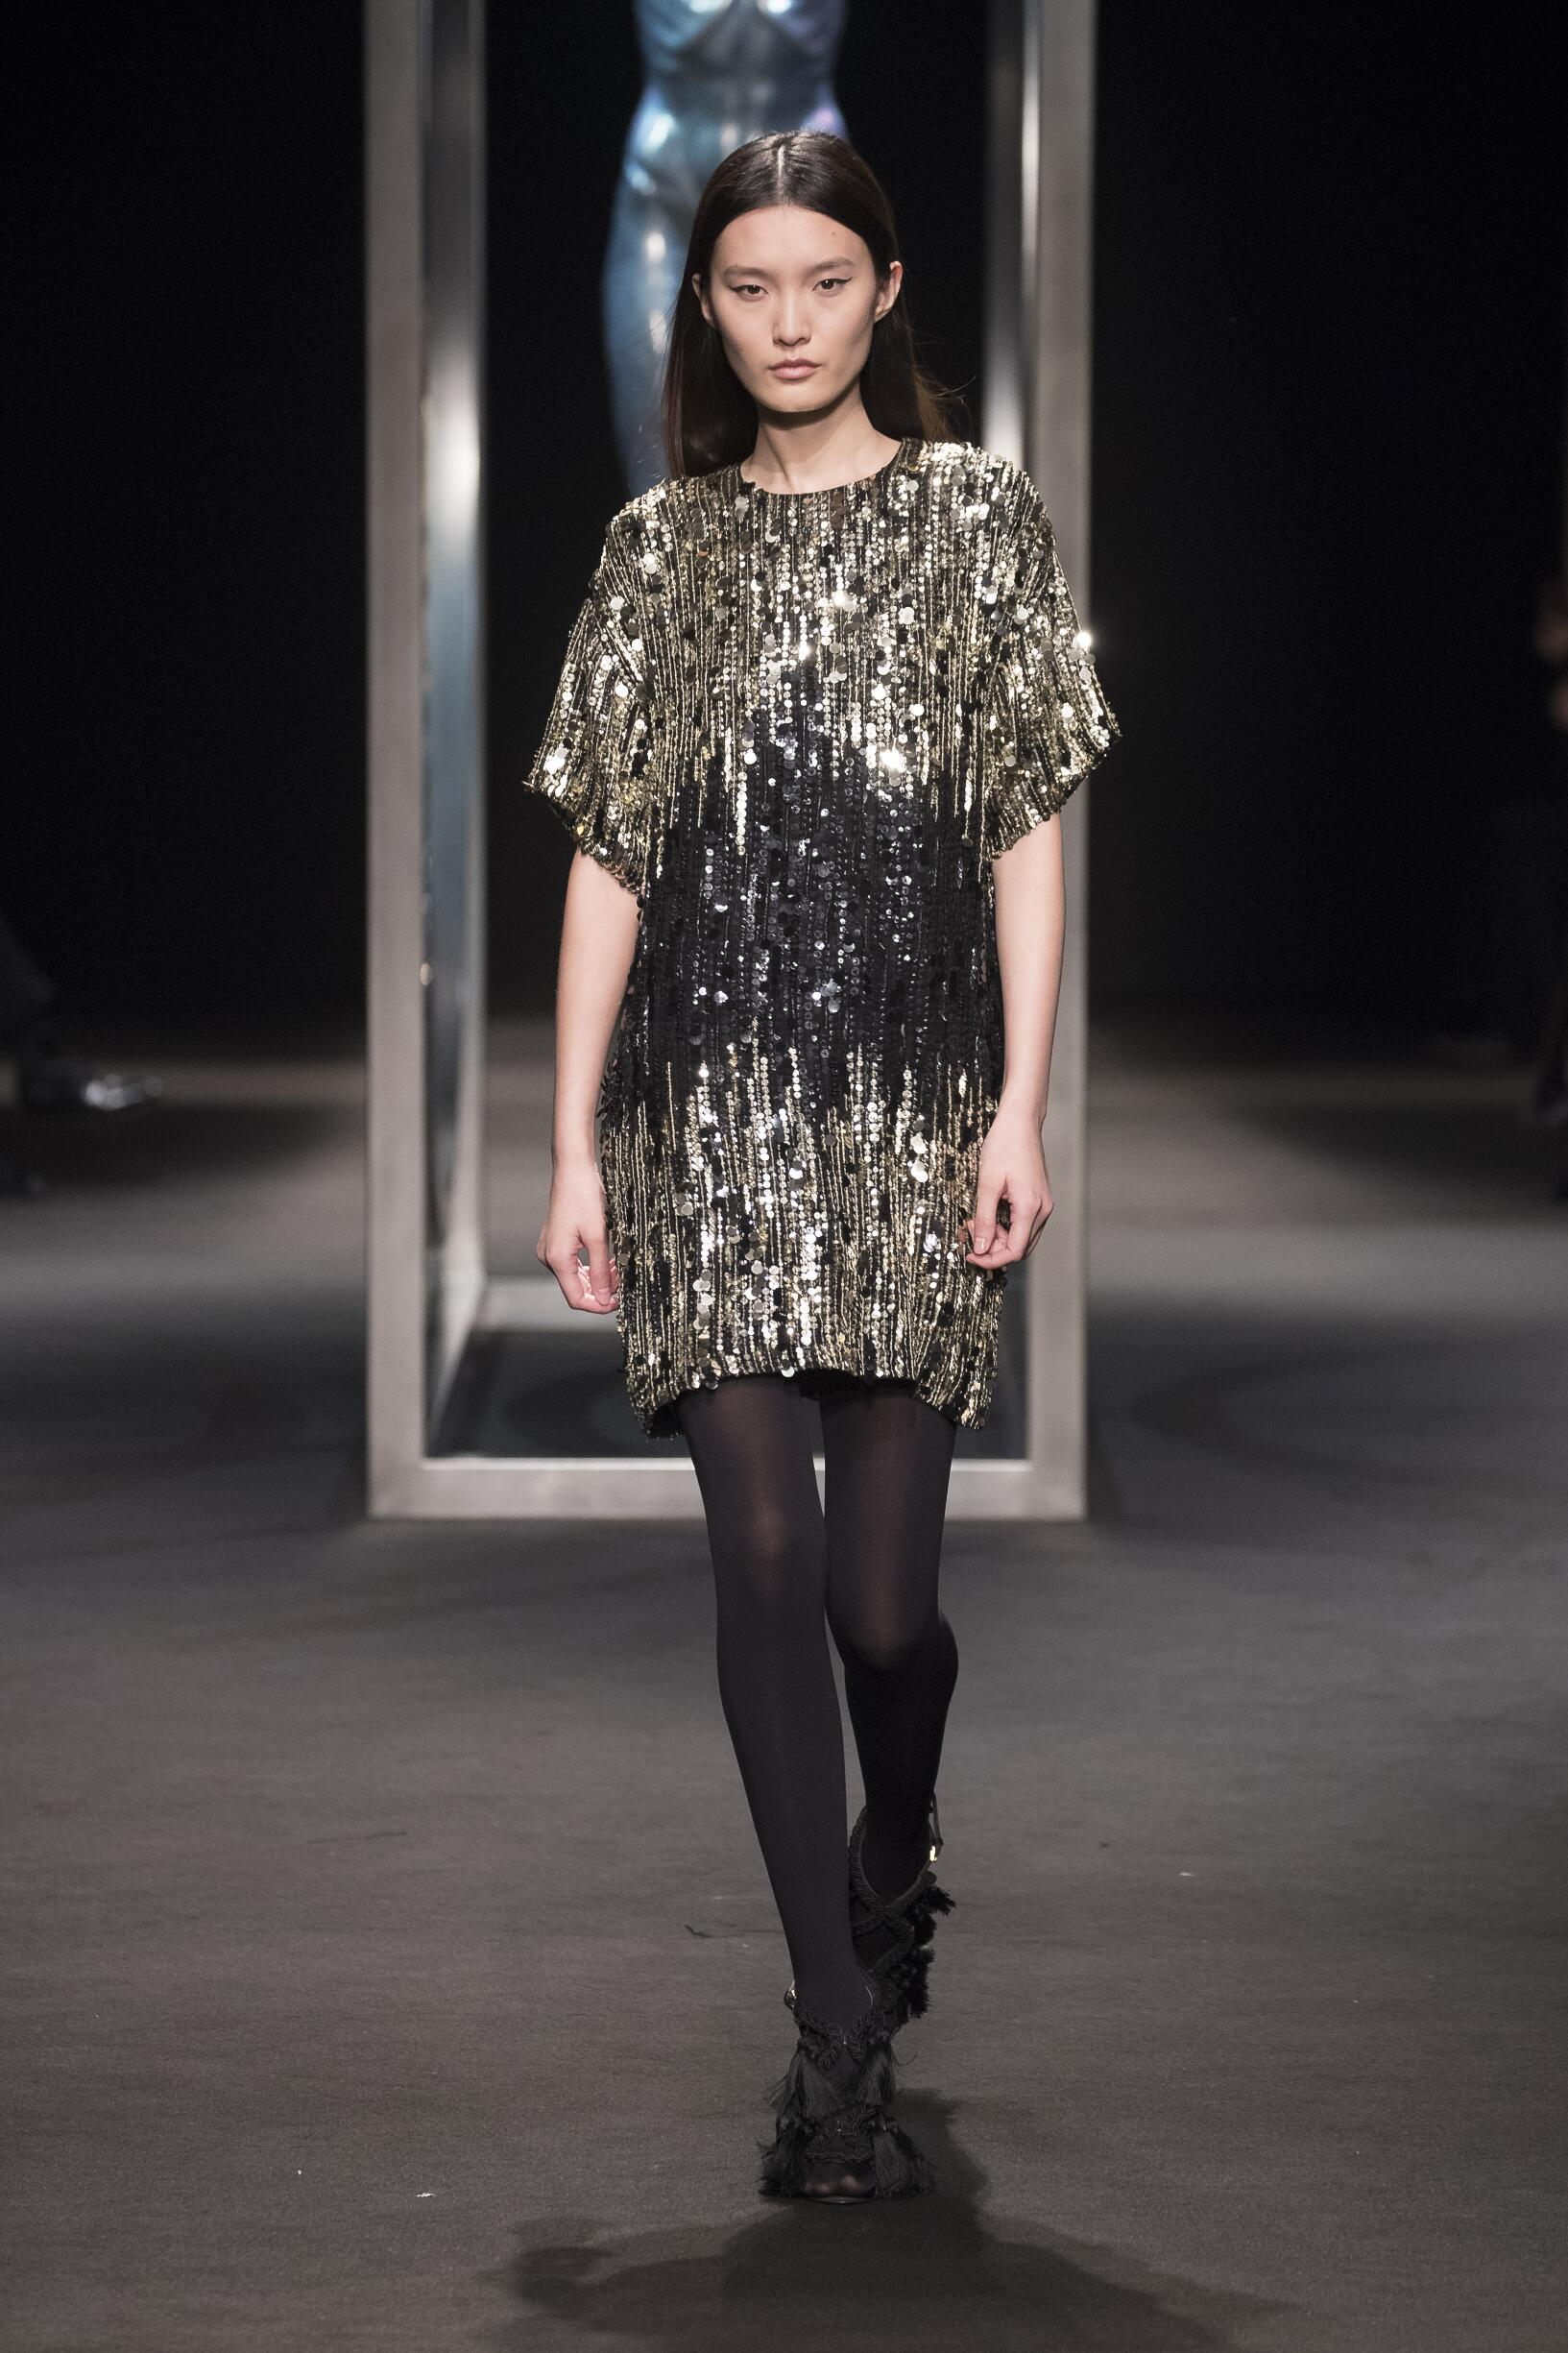 Catwalk Alberta Ferretti Woman Fashion Show Winter 2018